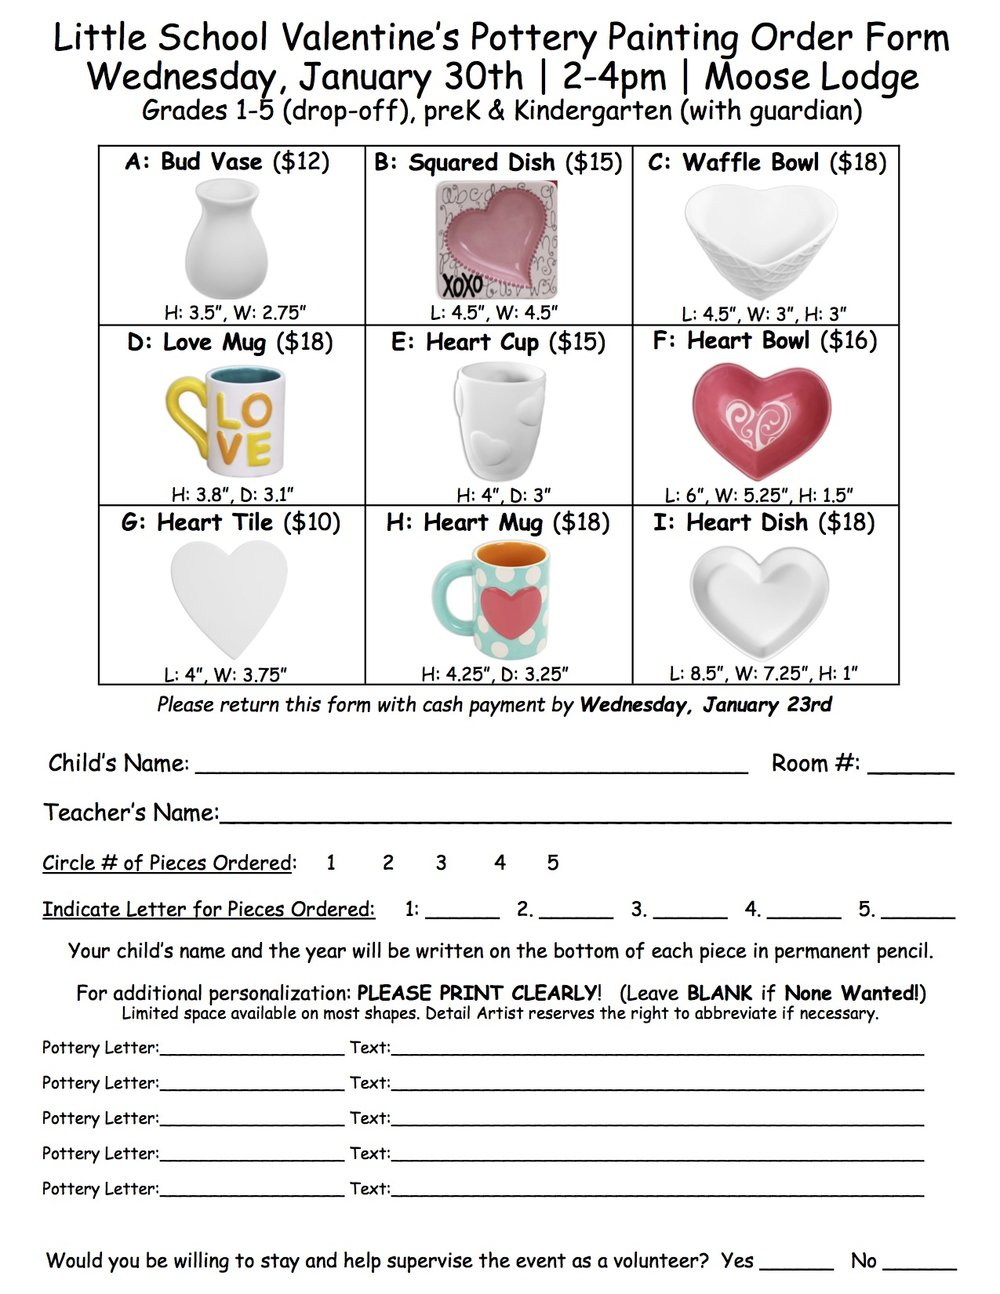 Valentine's Painting Order Form Little School 2019.jpg